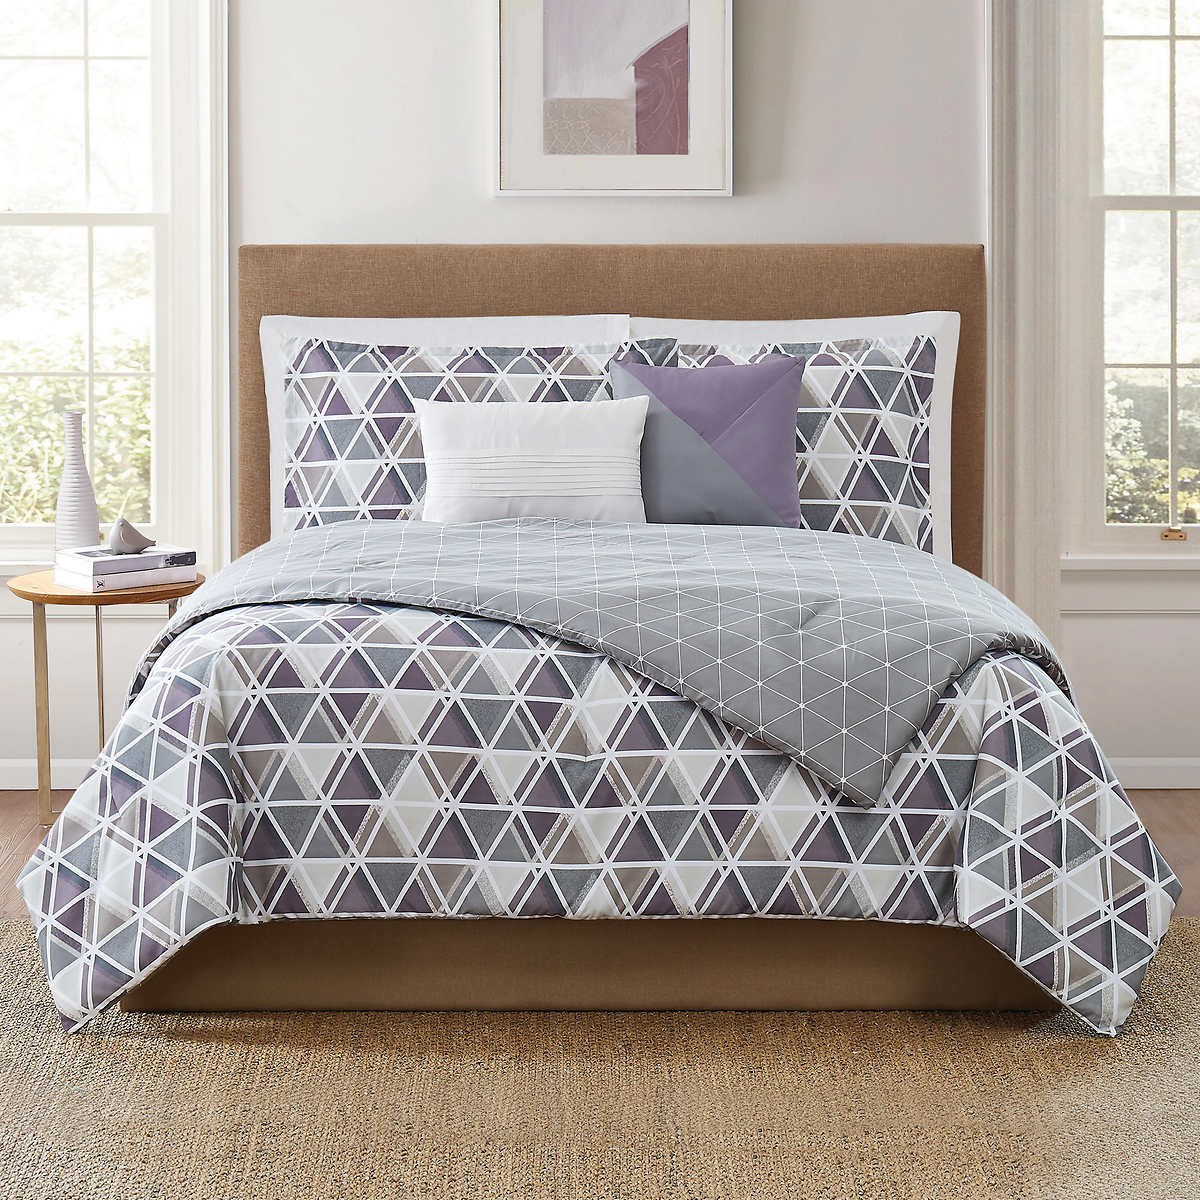 Chelsea printed duvet SET single double king super king quilt cover set  bedding